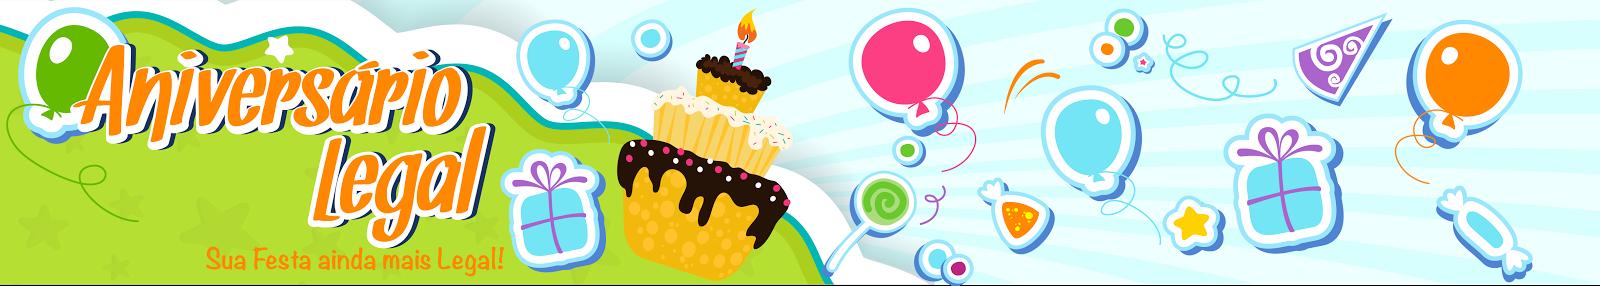 Aniversário Legal Minions